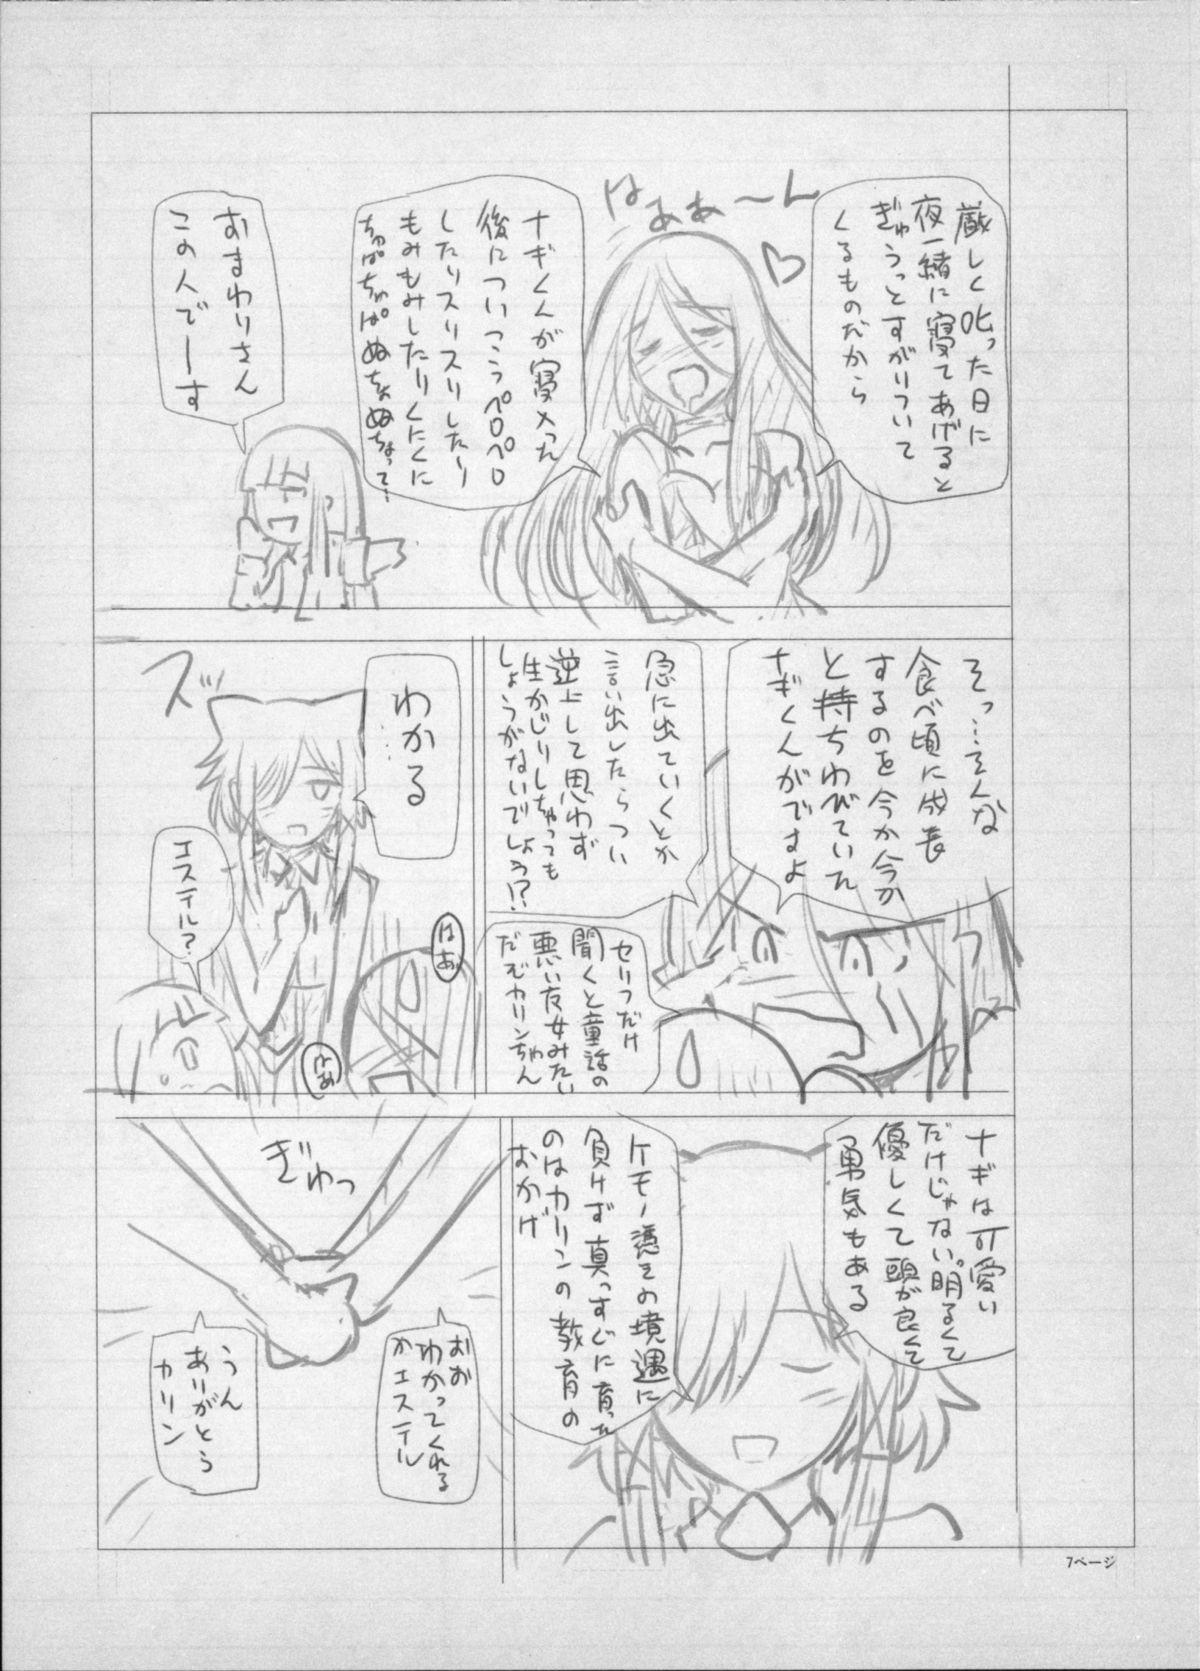 Majo × Shota ~ Genteiban | 魔女X小正太 限定版 262